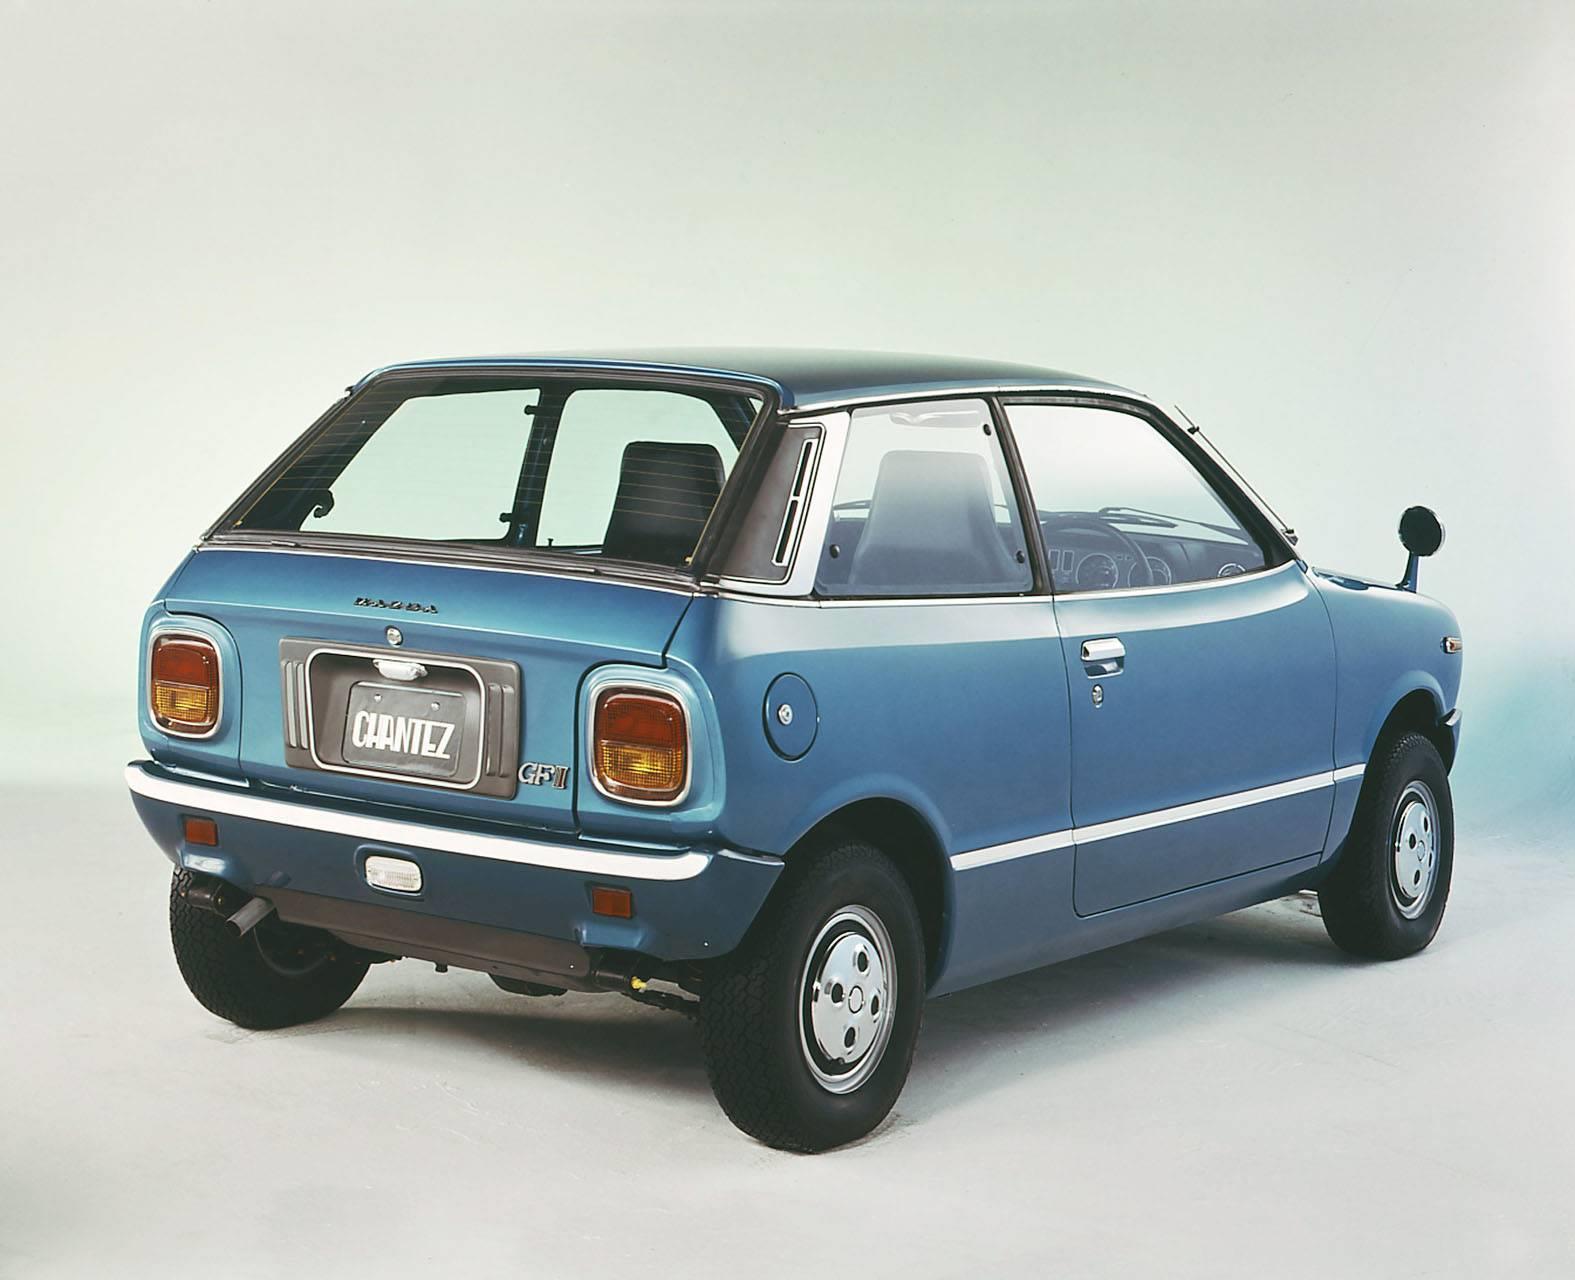 1975 Mazda Chantez